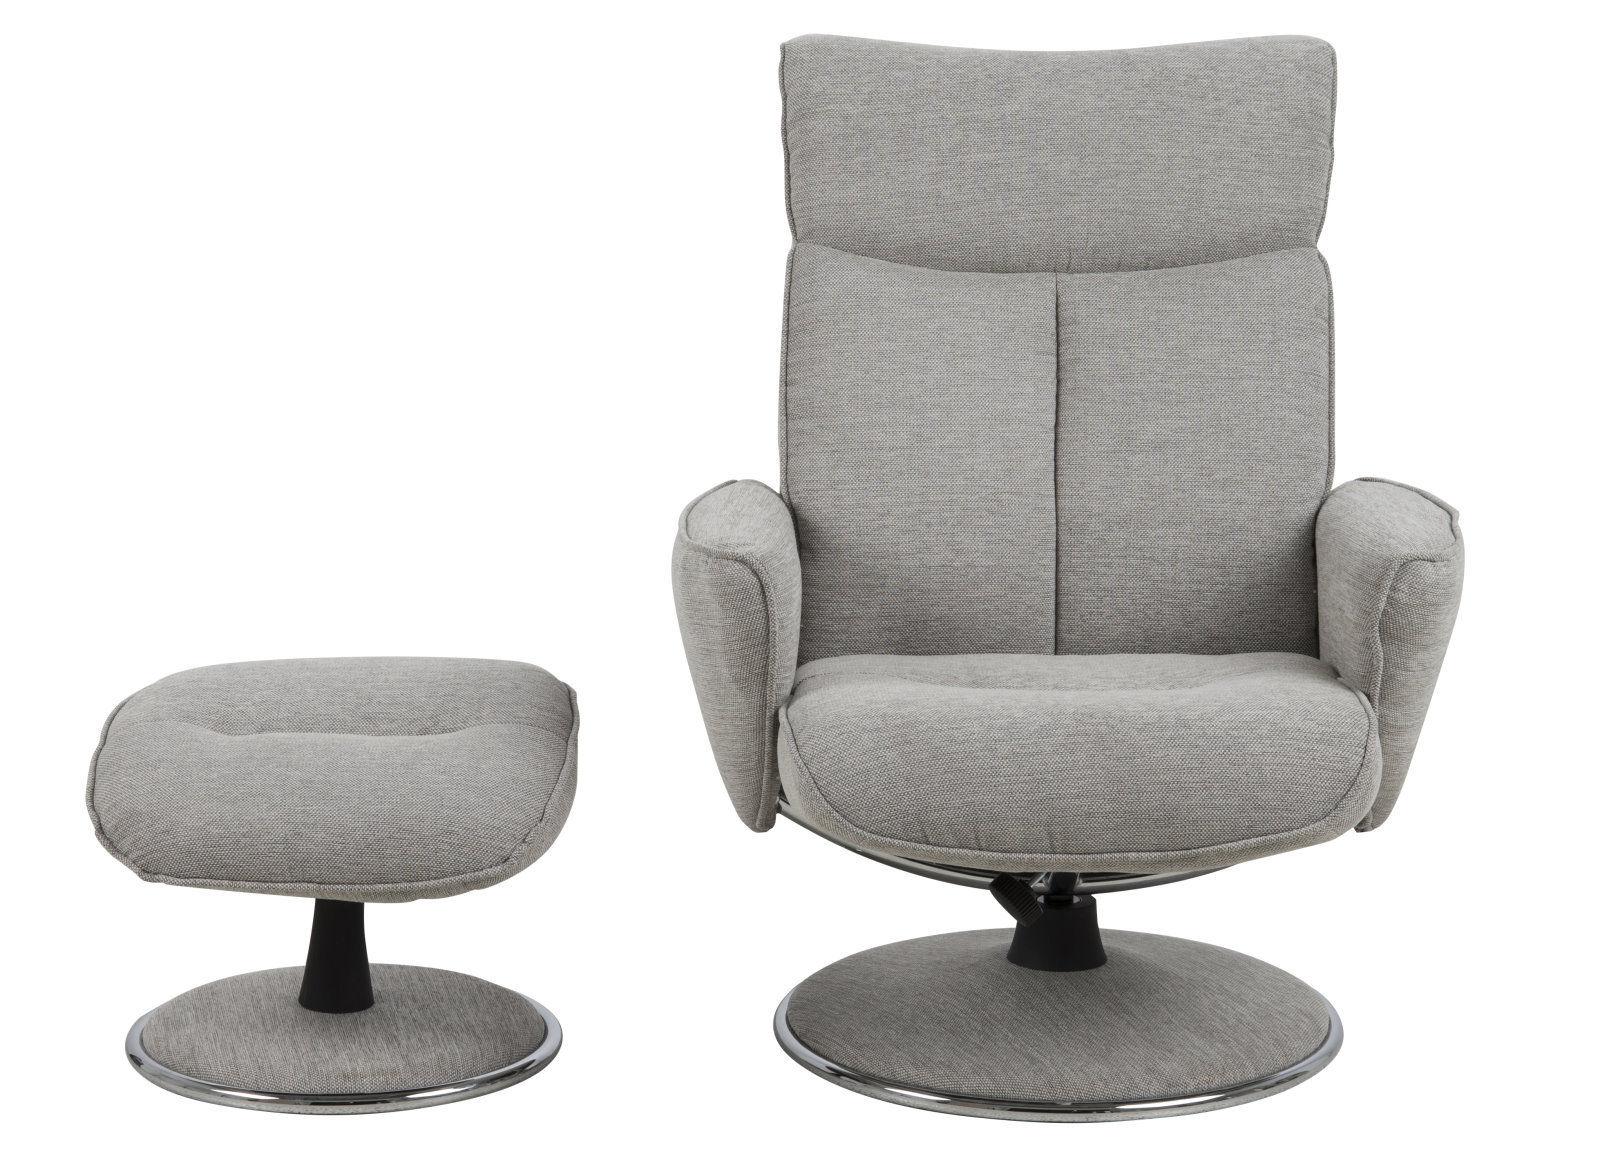 Clubsessel weiß grau  PKline Relaxsessel Drehsessel grau Loungesessel Sessel Stuhl ...